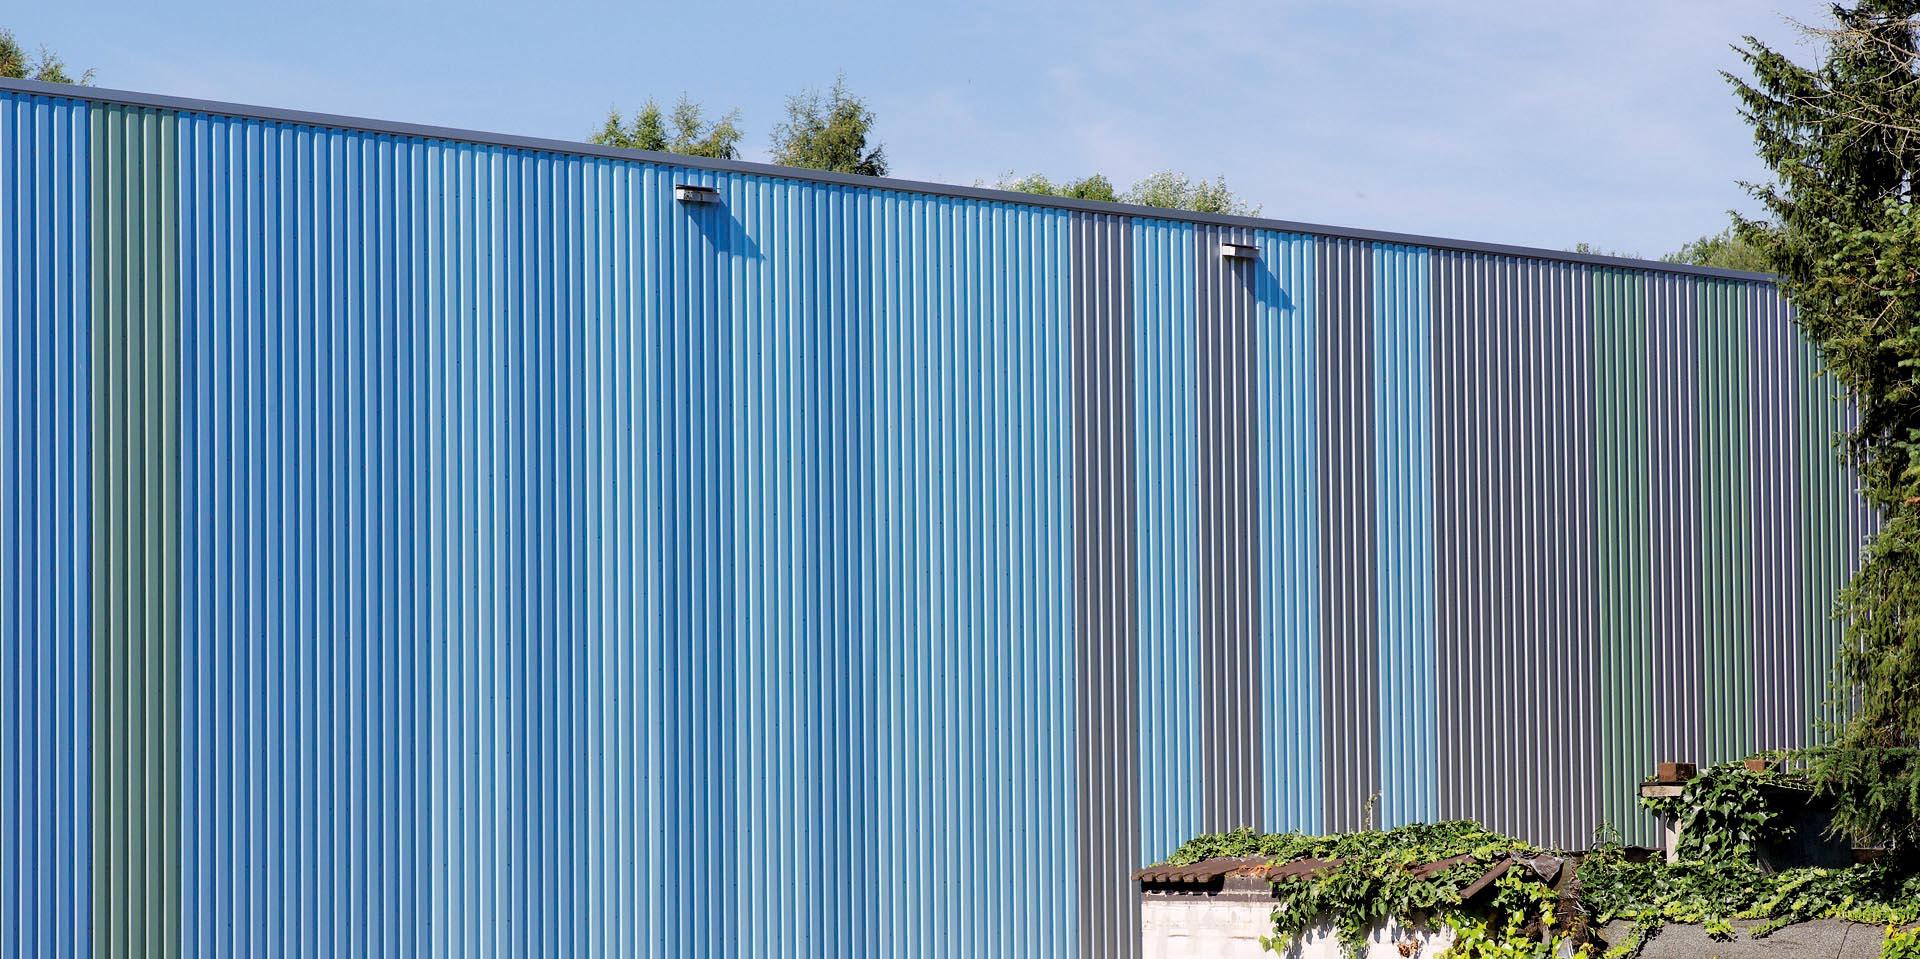 industrie-halle-01.jpg